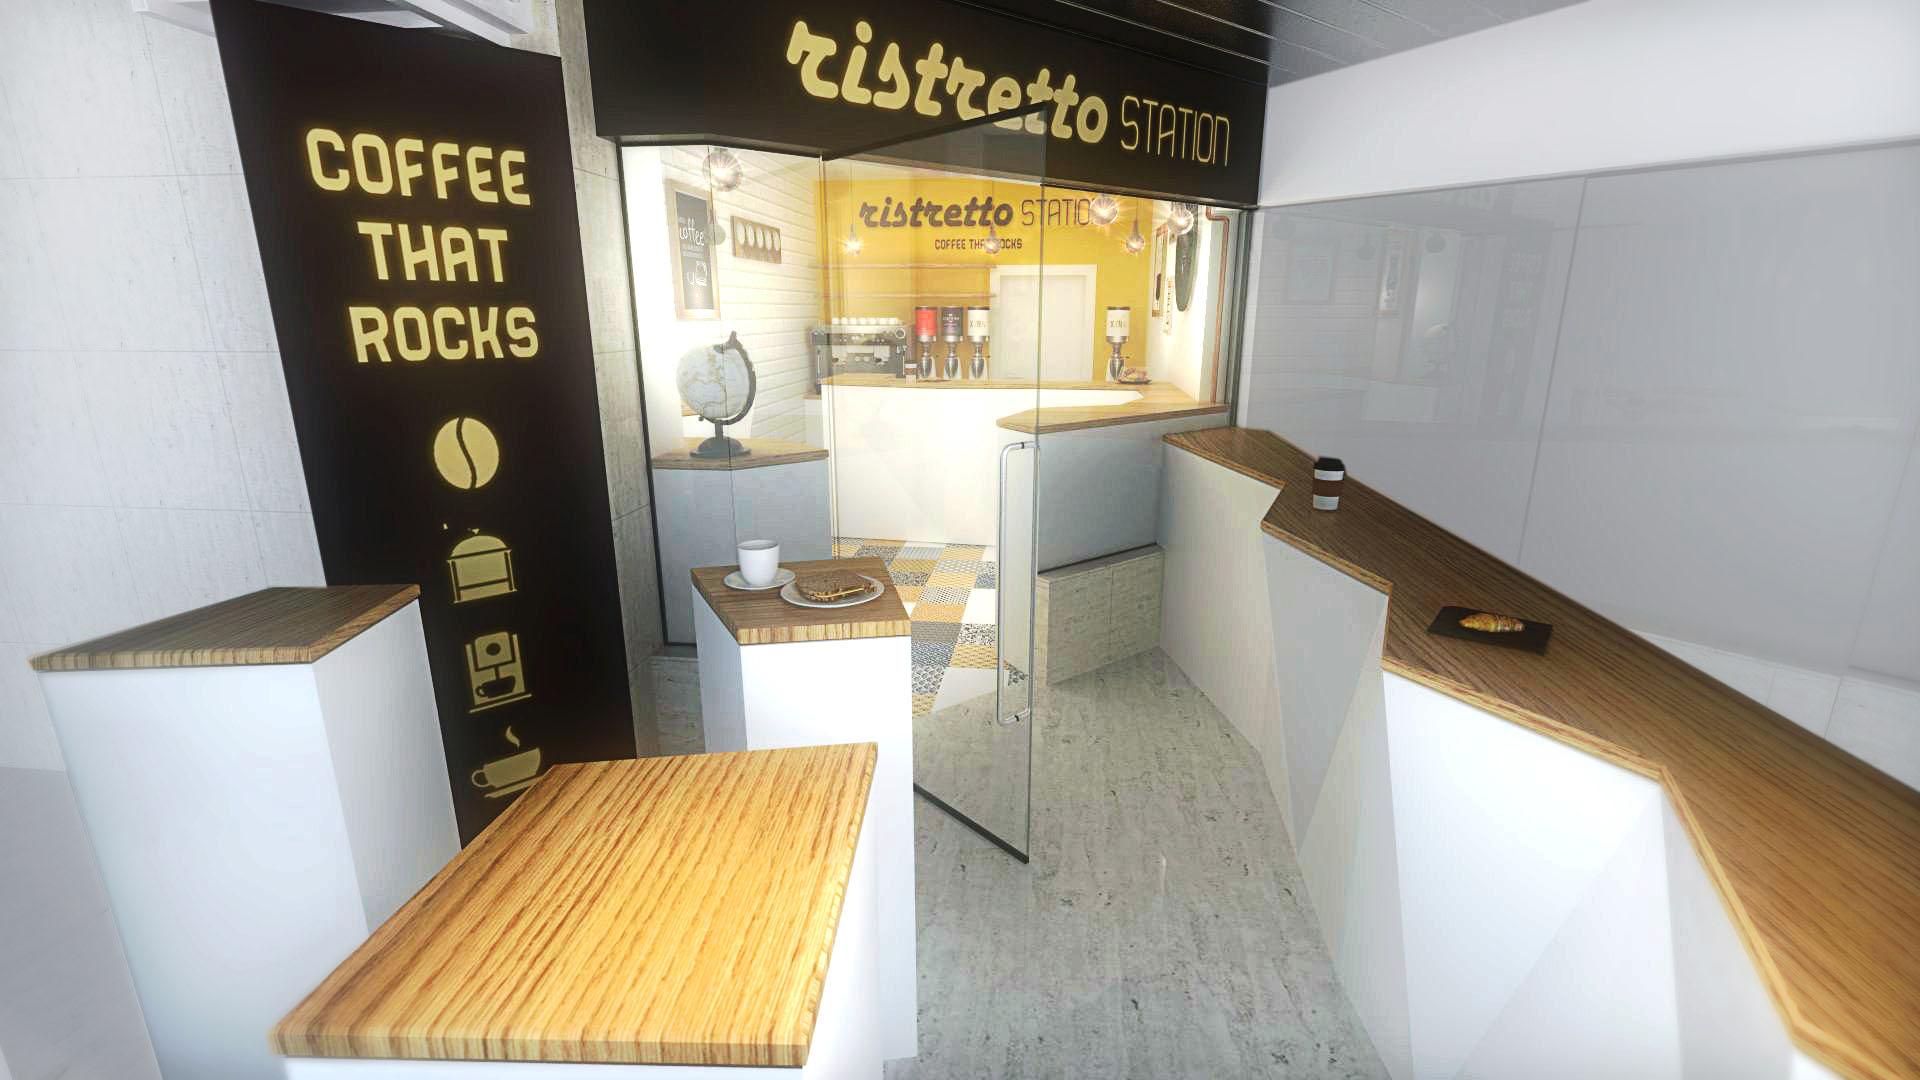 RISTRETTO STATION COFFEE SHOP 5